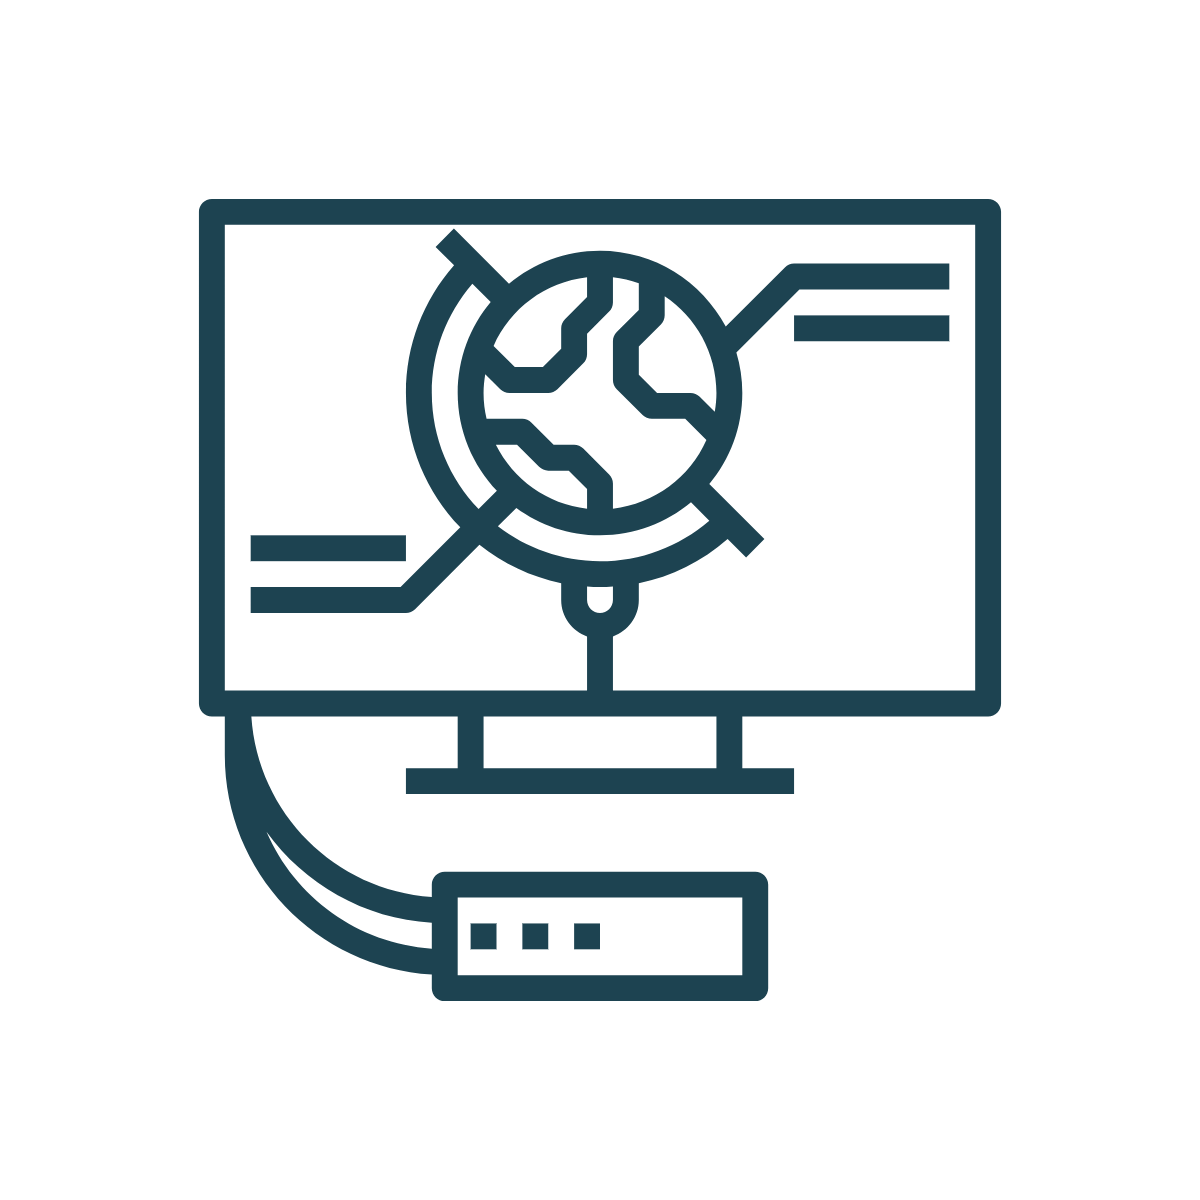 network simulation icon